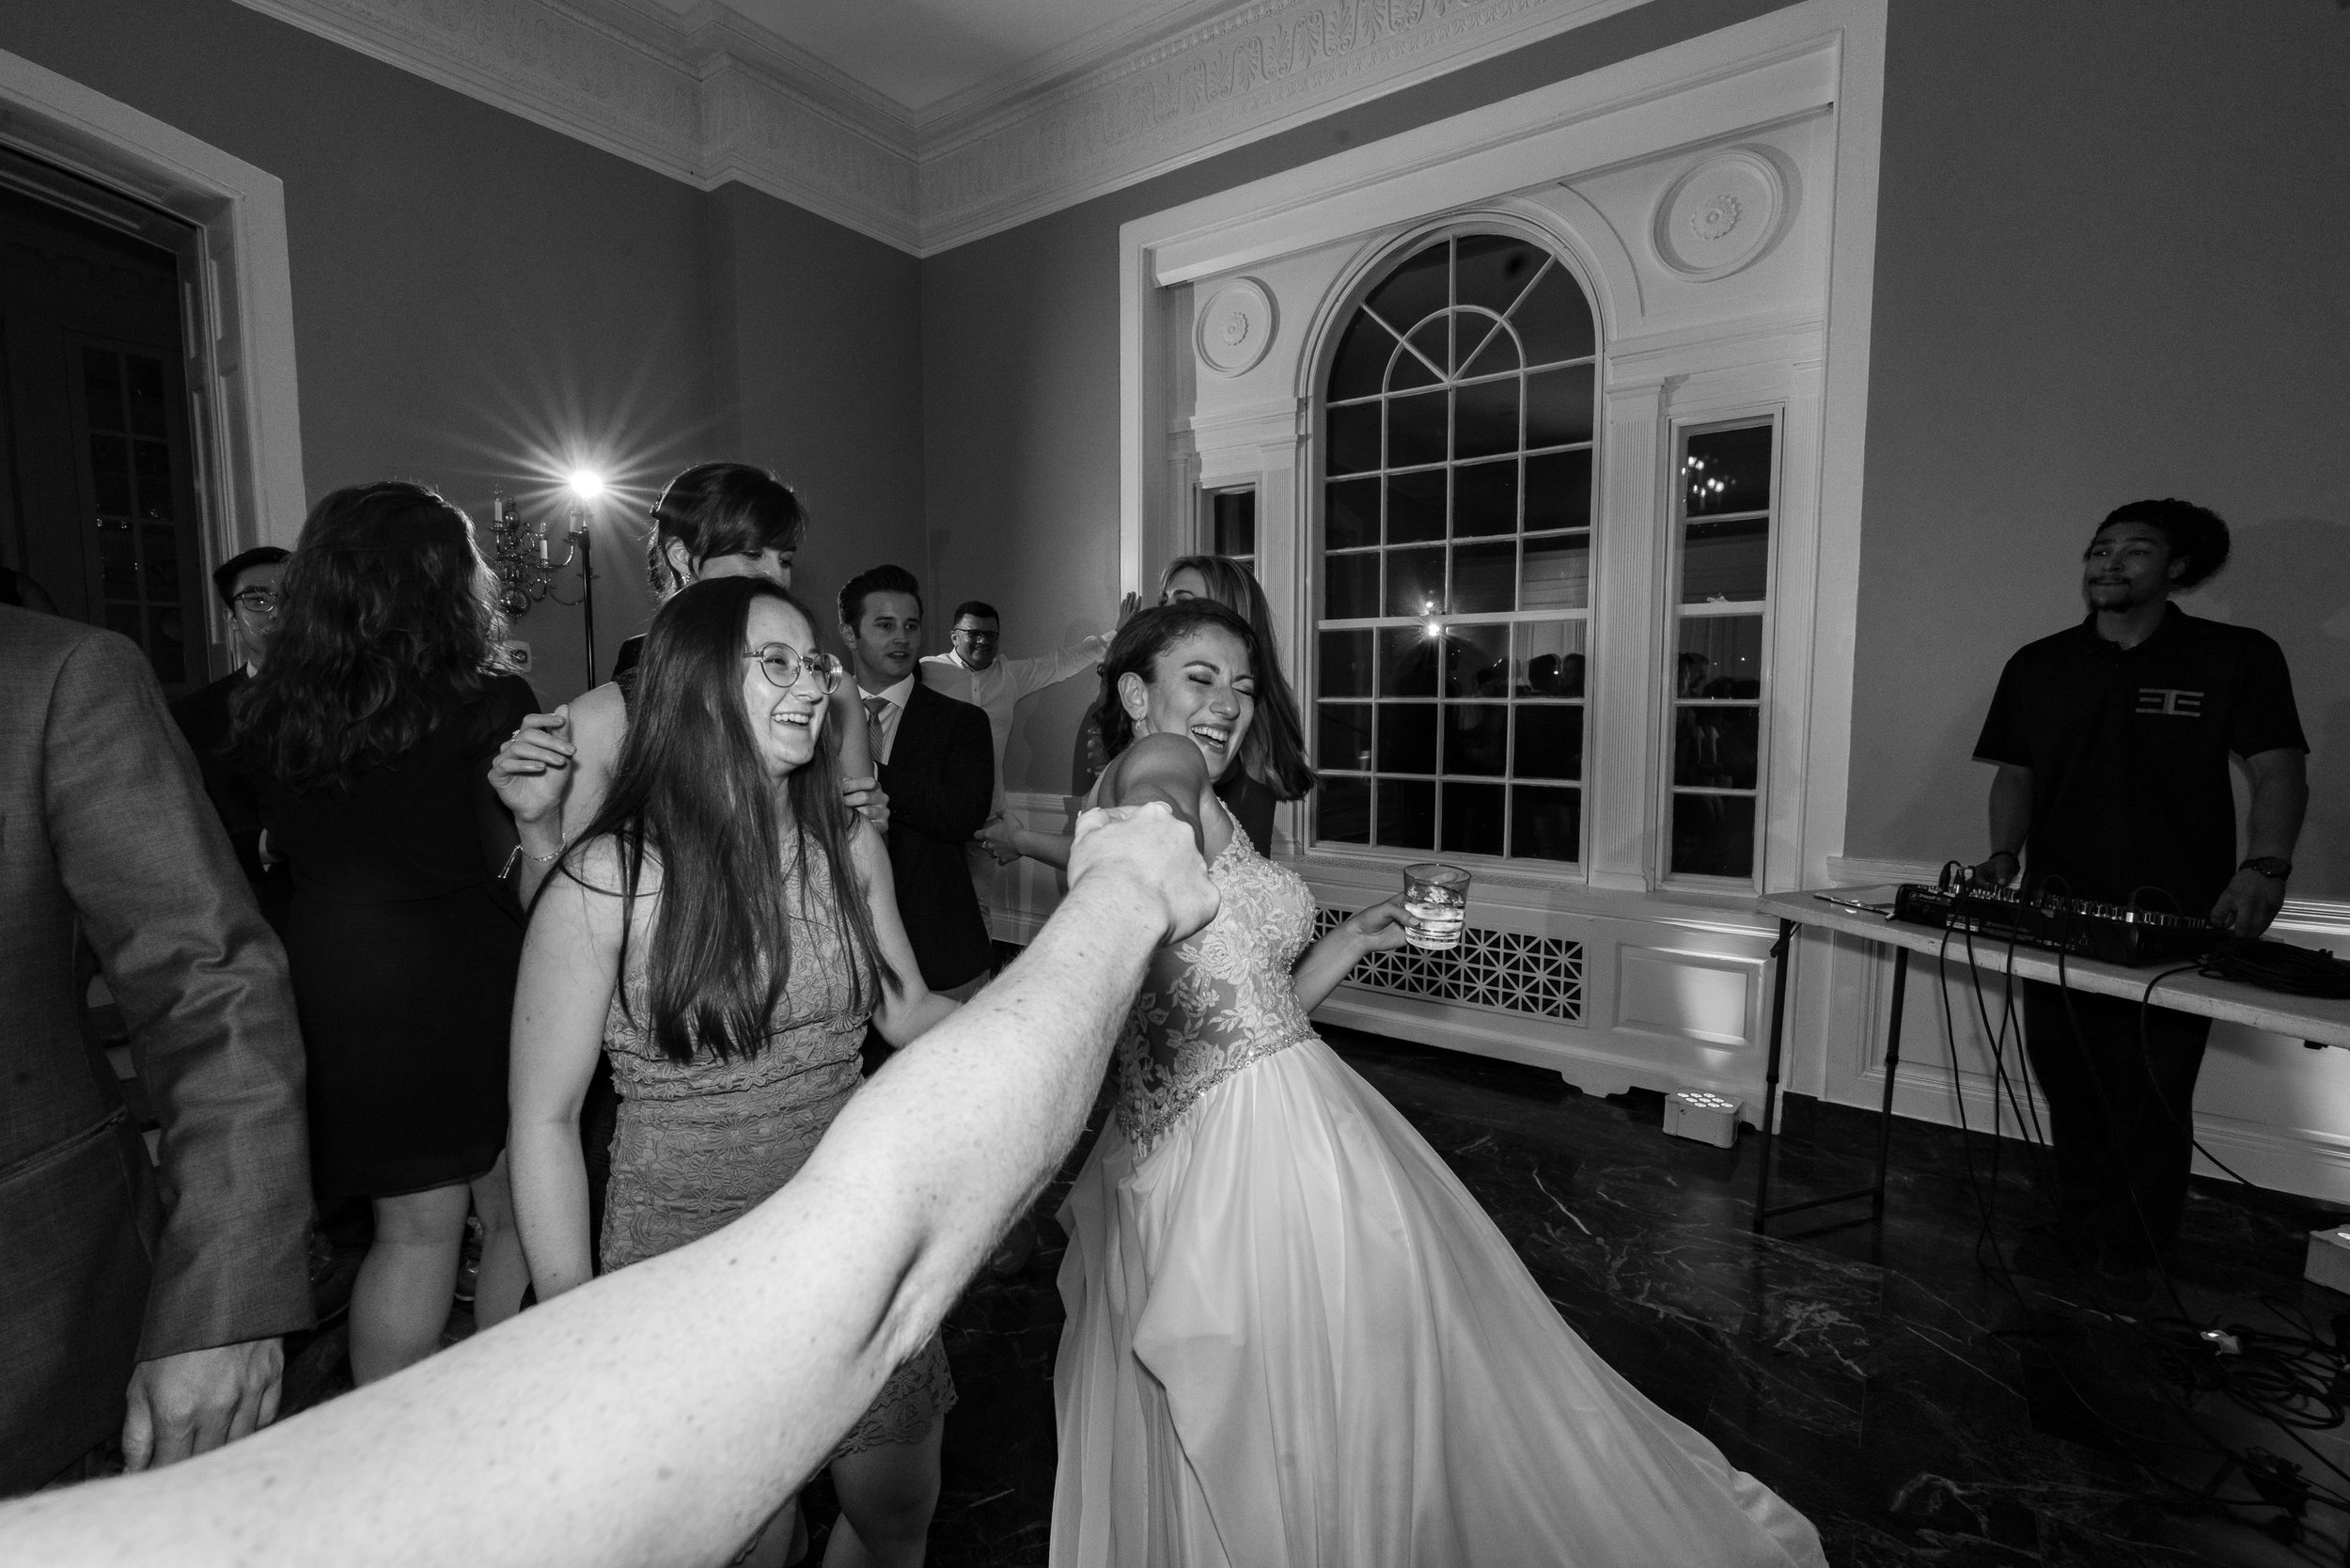 Fun wedding photography captures bride dancing at washington dc reception